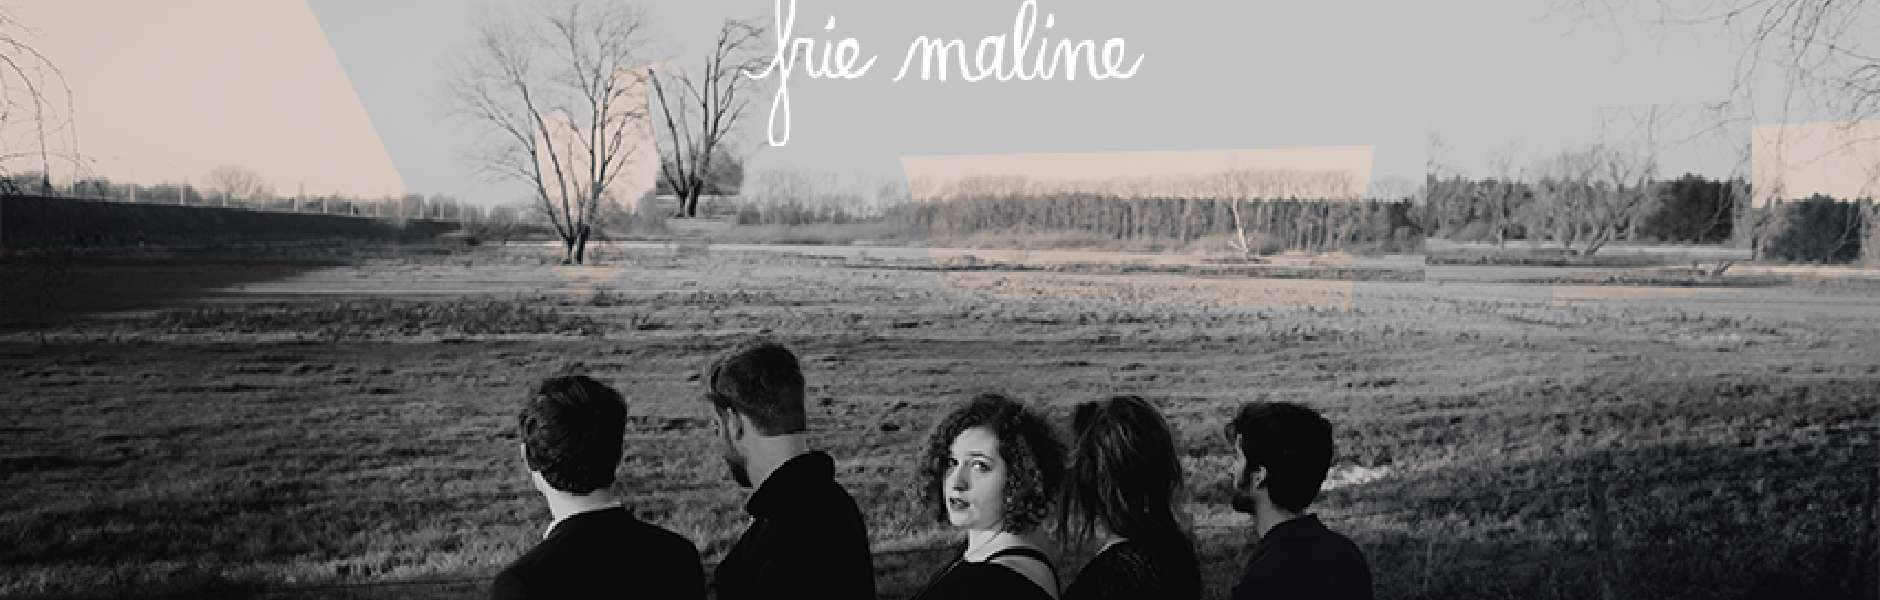 Frie Maline